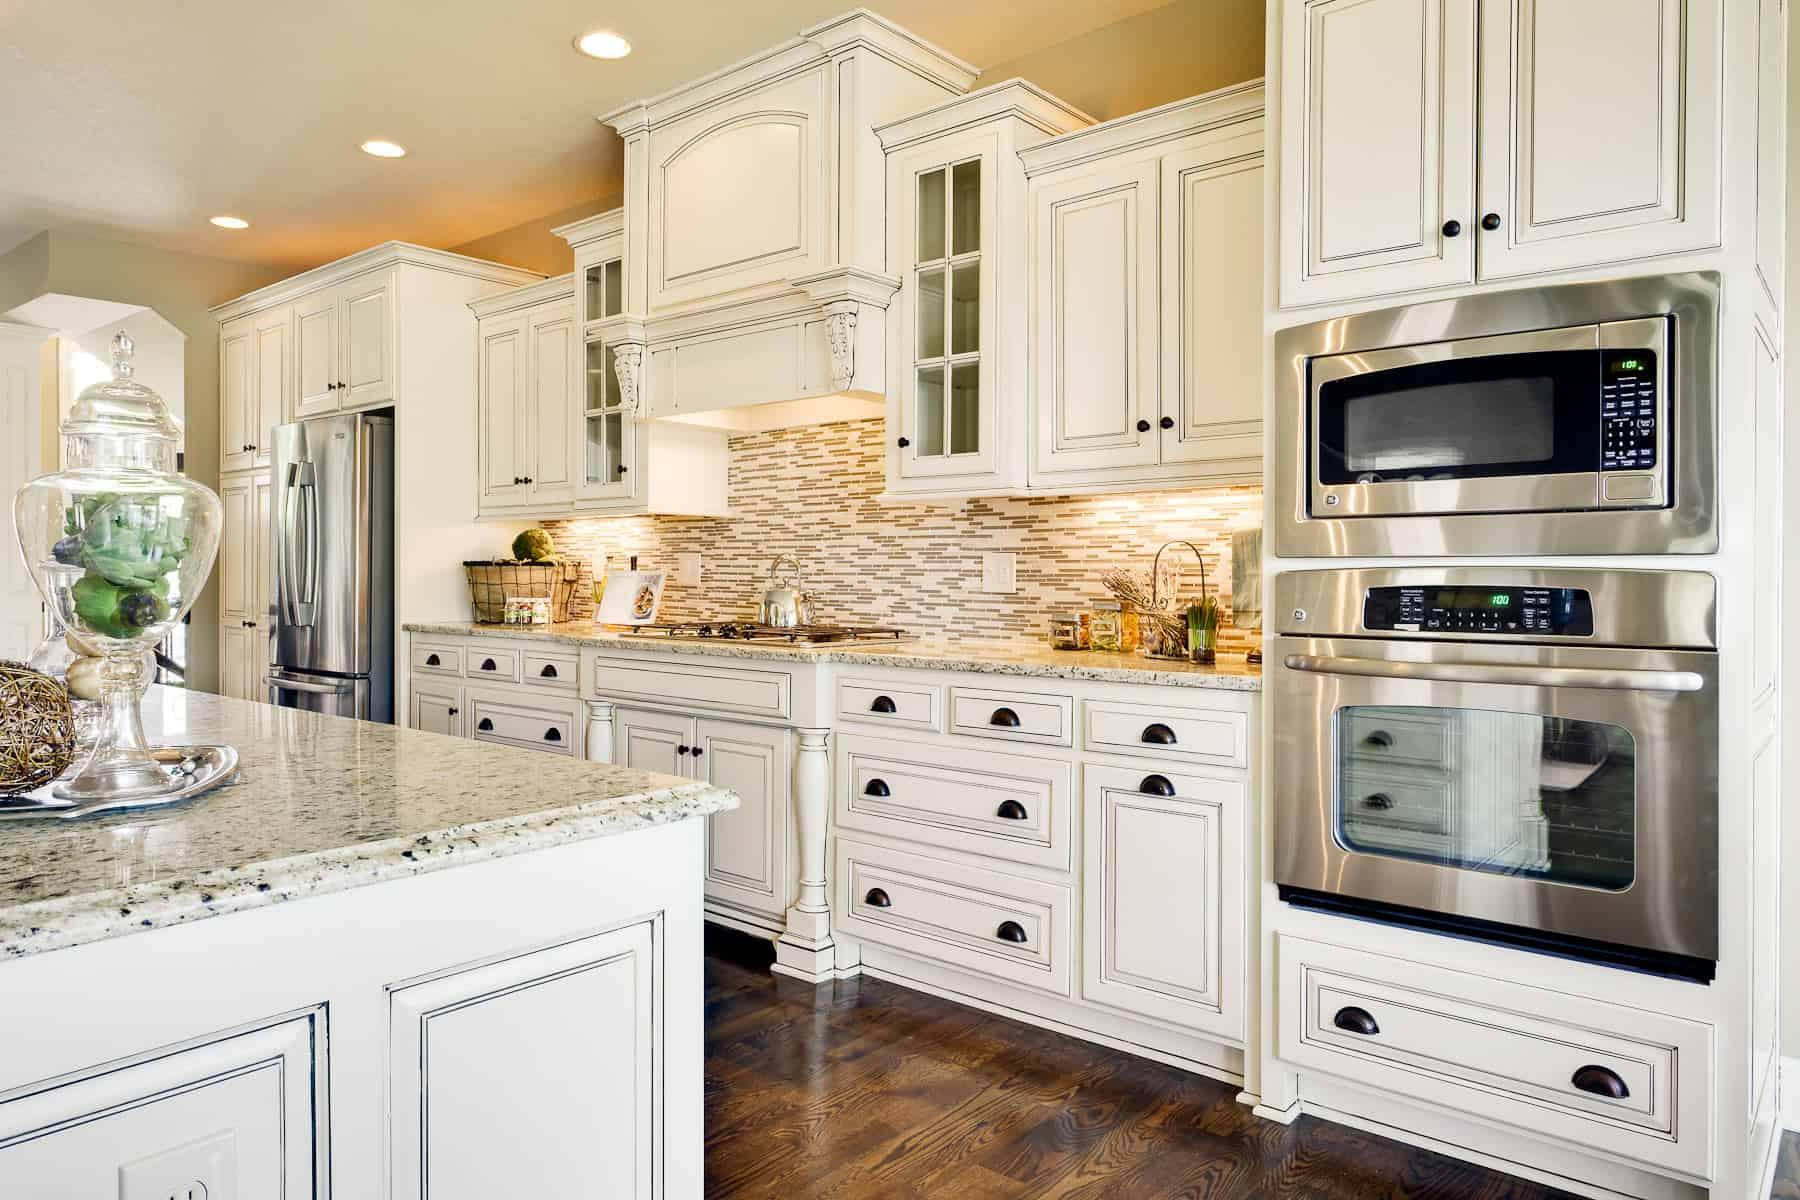 granite countertops cost countertops for kitchens Granite Countertops Cost Factors